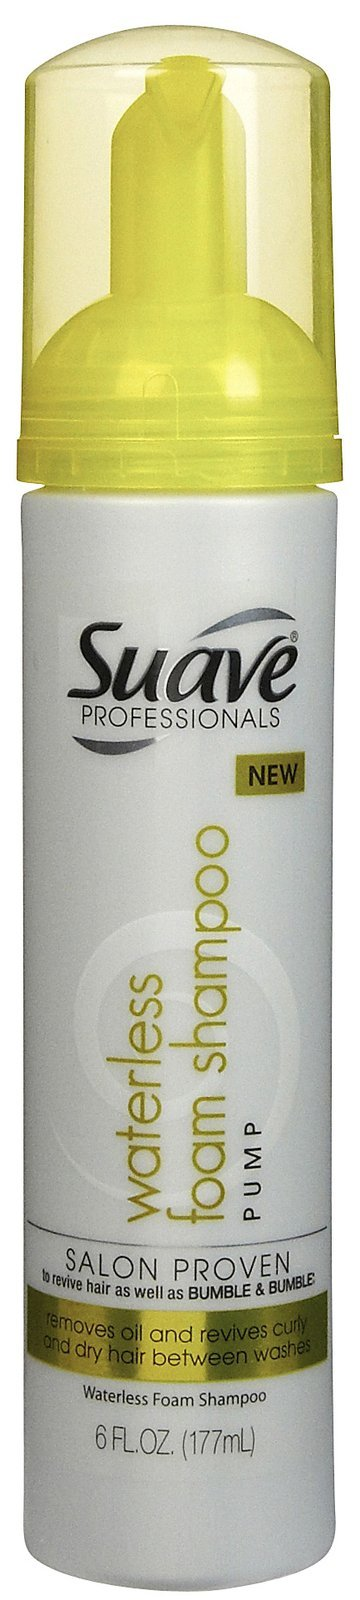 Suave Professionals Waterless Foam Shampoo Pump